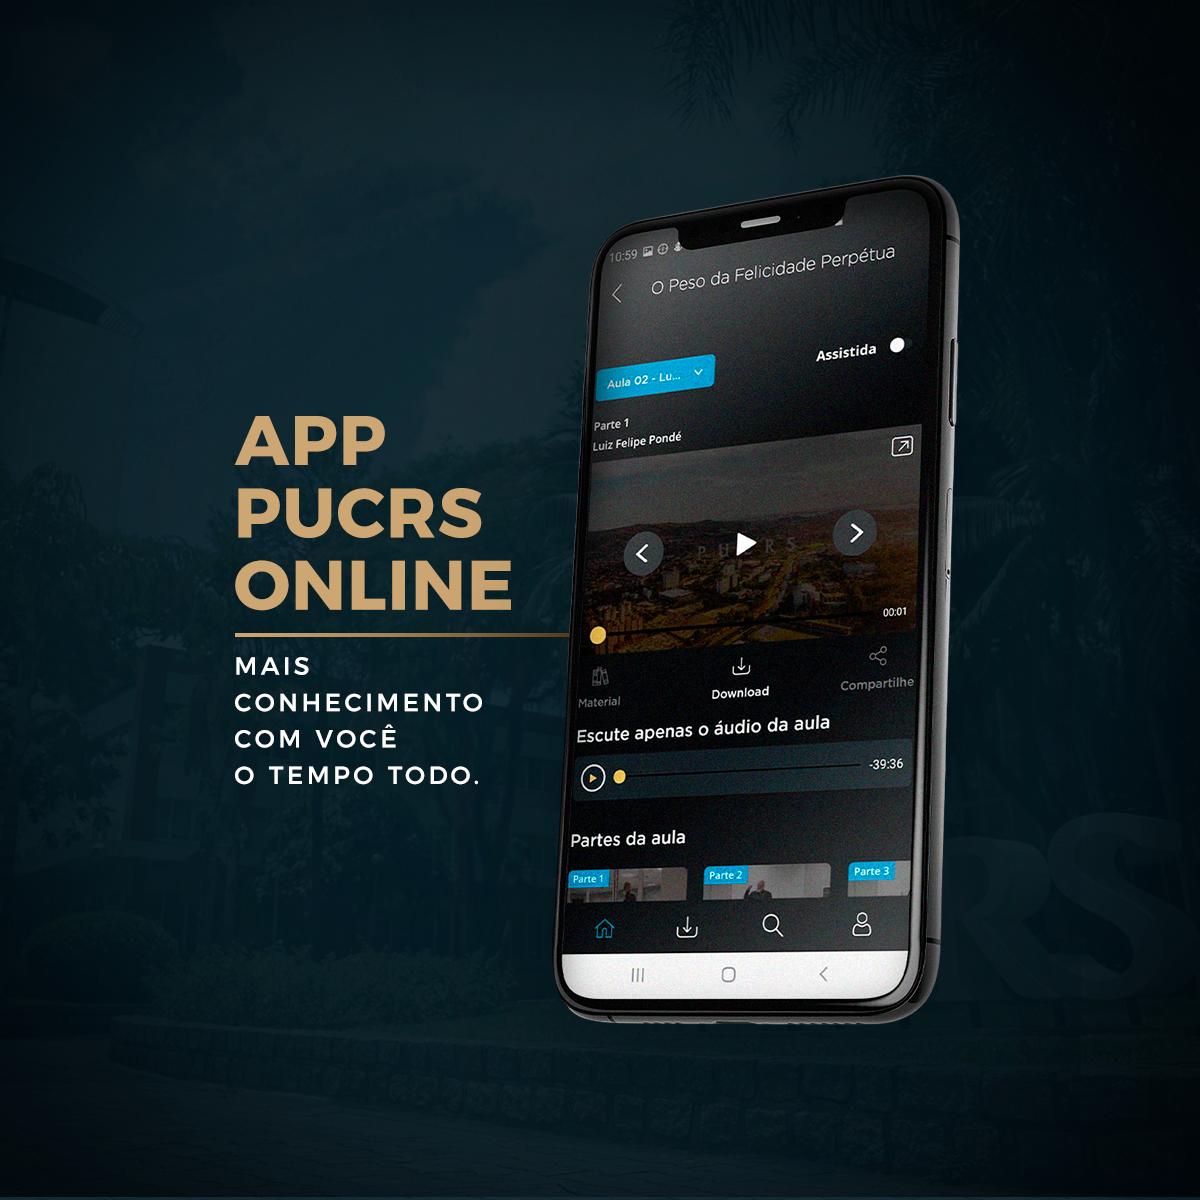 app pucrs online, online, aplicativo